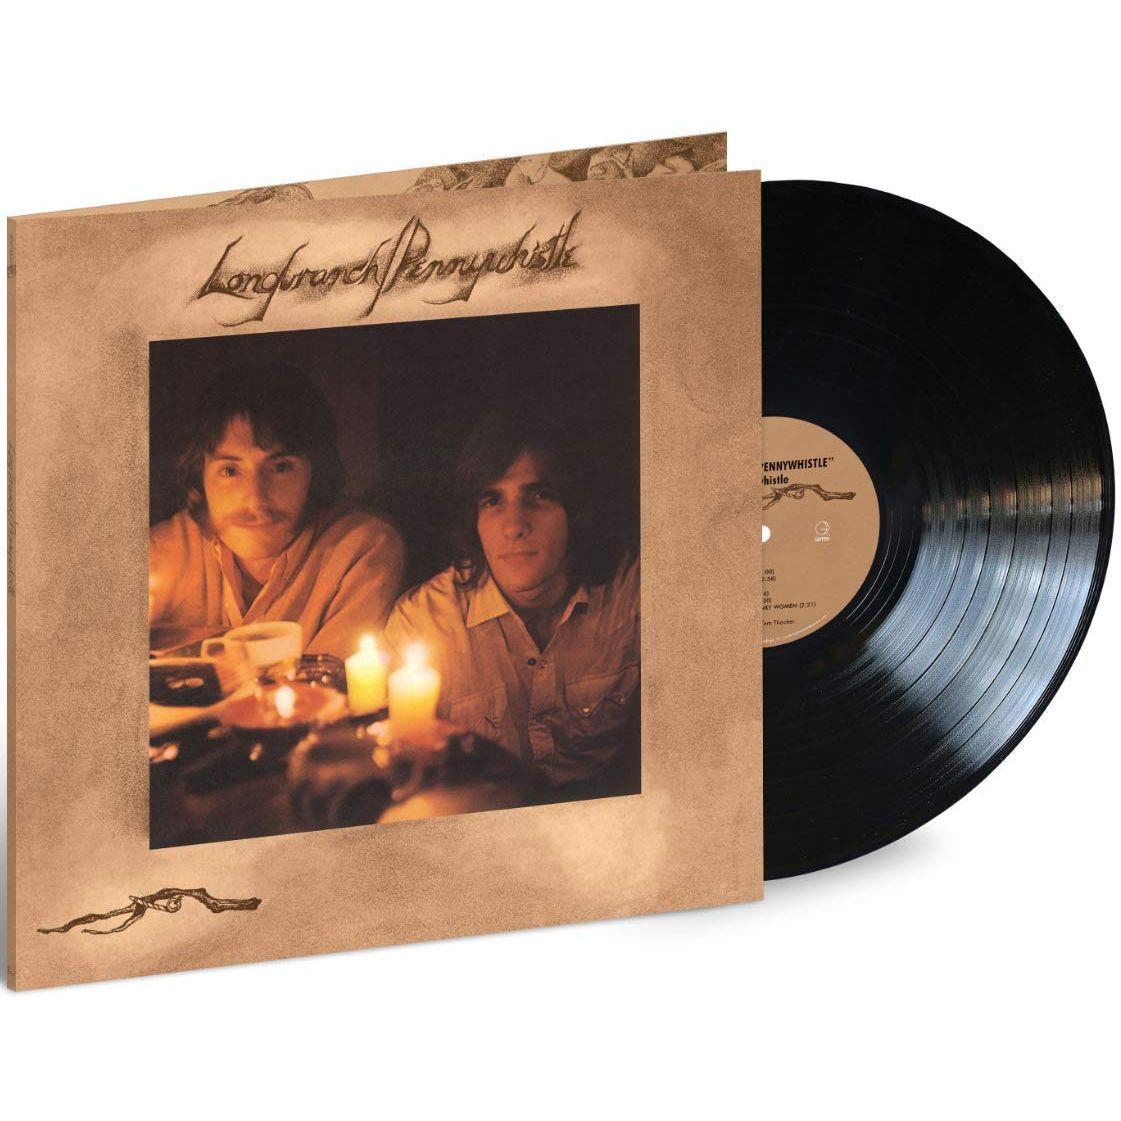 LONGBRANCH/PENNYWHISTLE / ロングブランチ/ペニーホイッスル / LONGBRANCH/PENNY WHISTLE (180G LP)